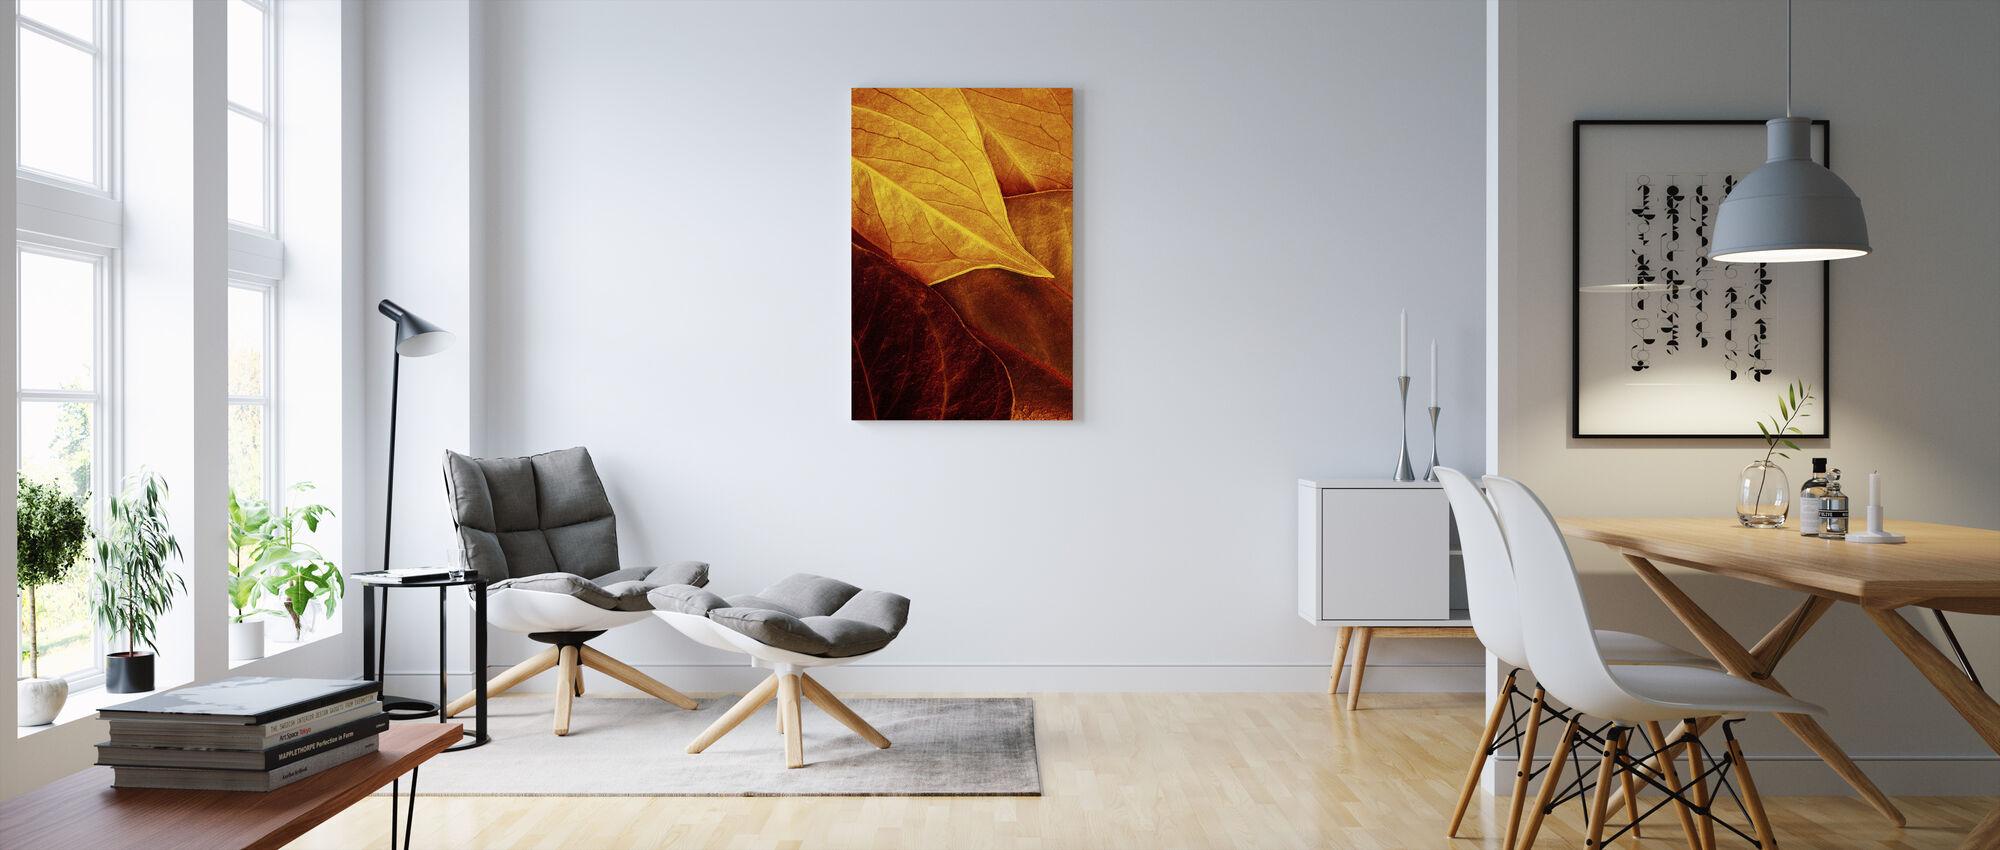 Golden Vessels - Canvas print - Living Room